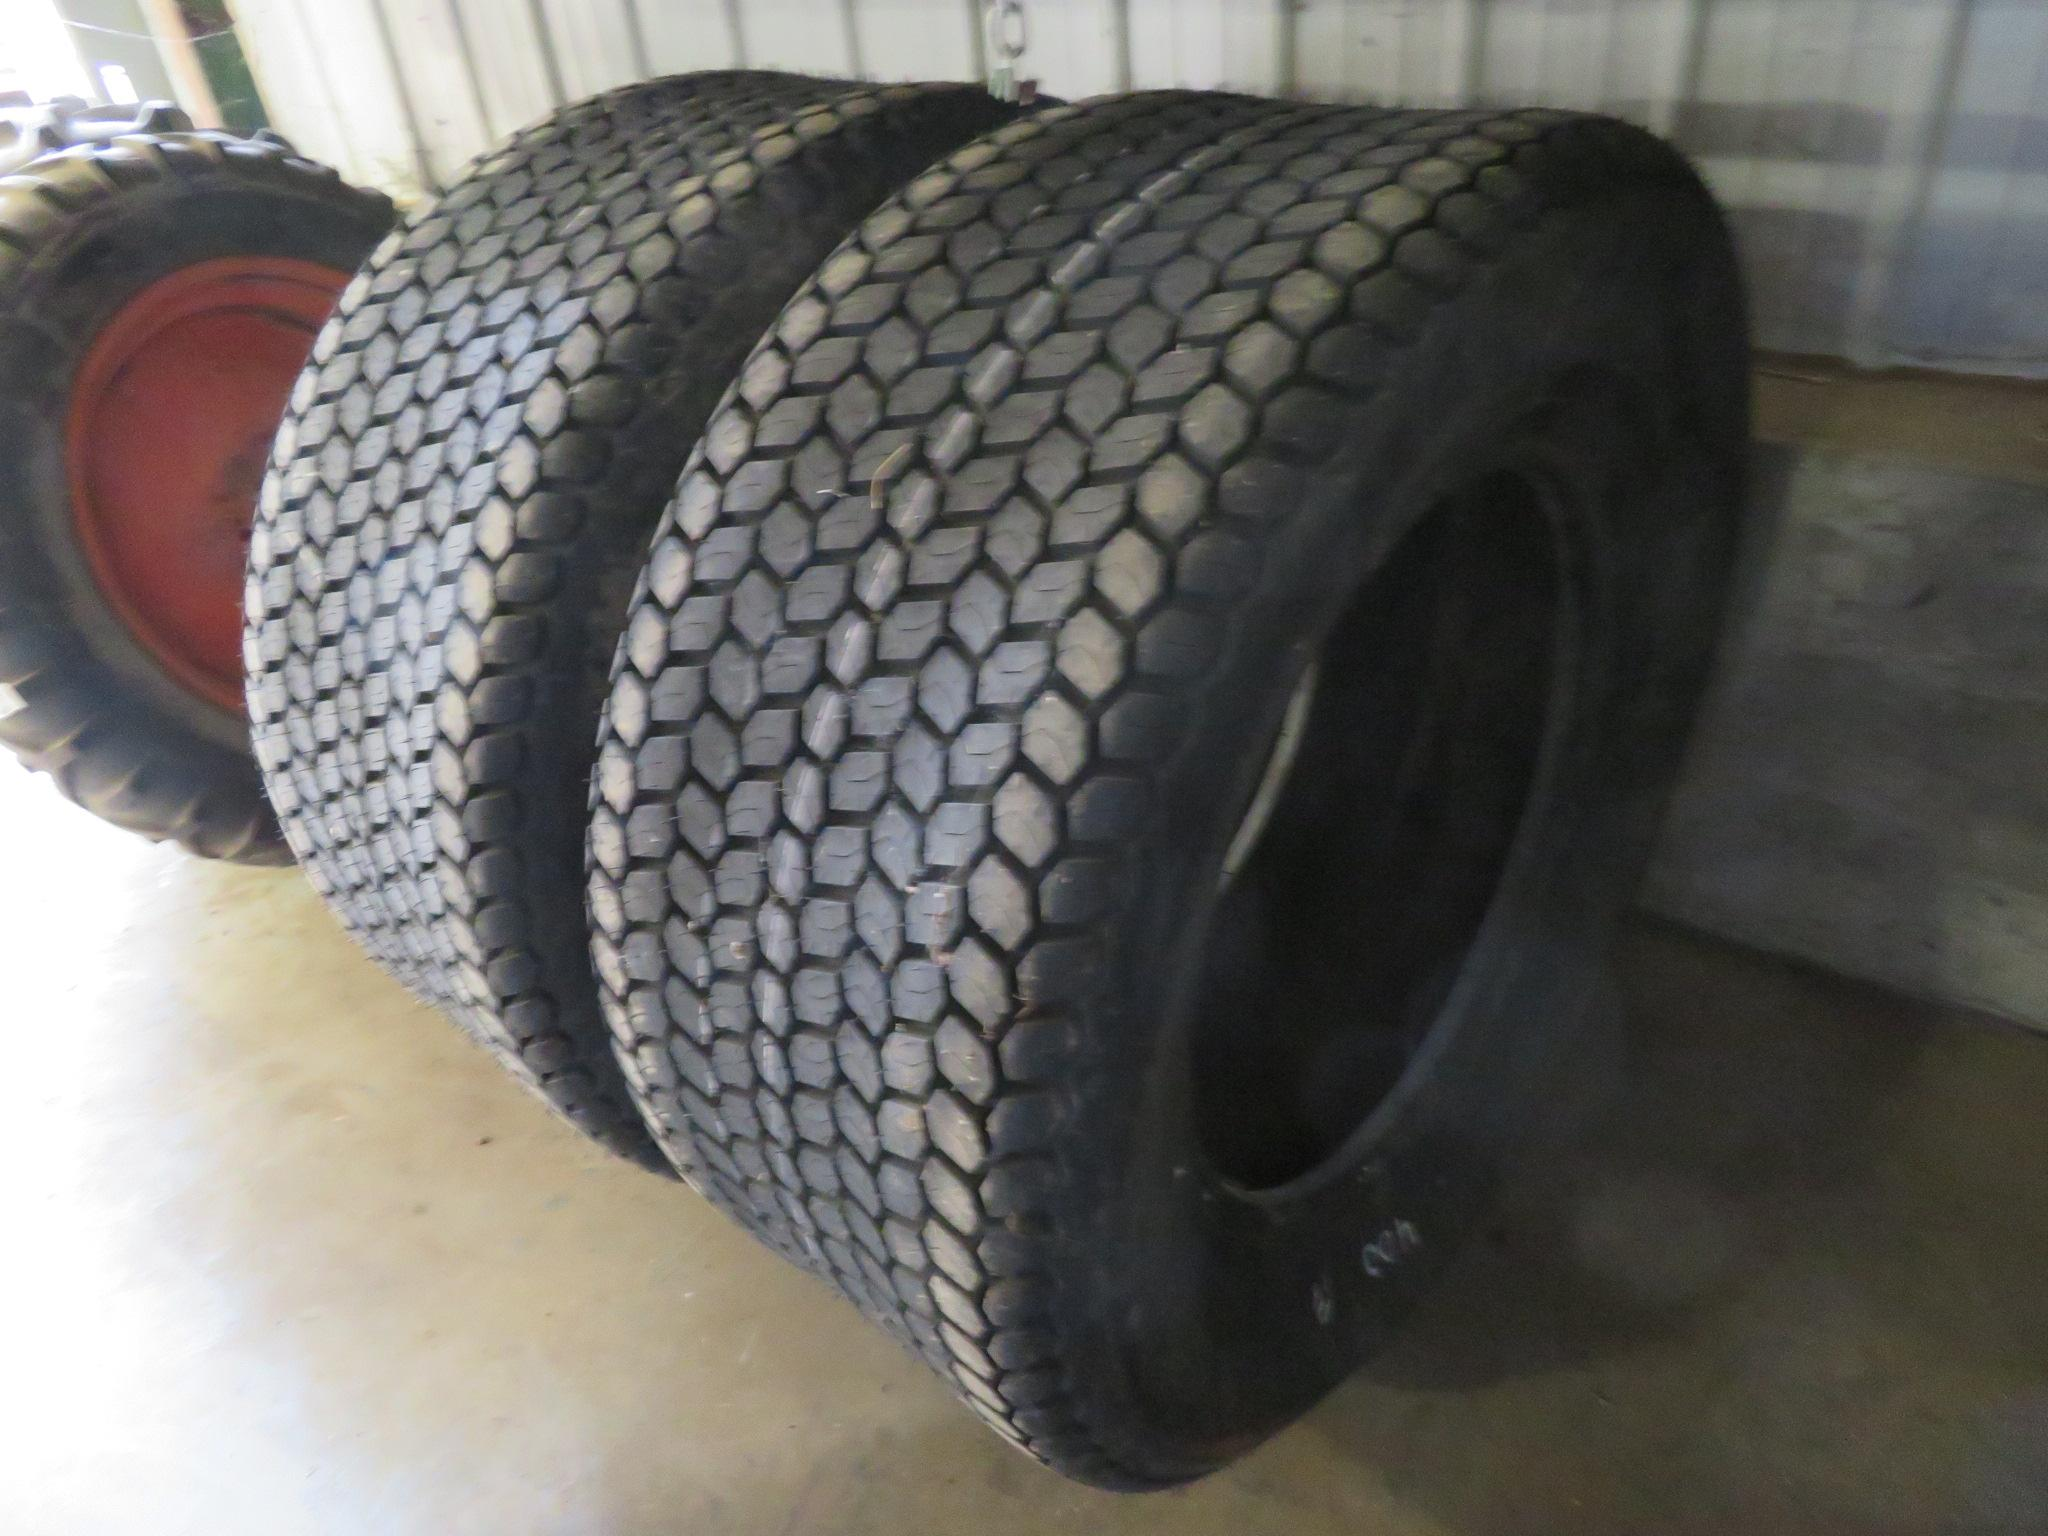 Firestone 460/60D 24 Flotation Super All Terrain Turf Tires